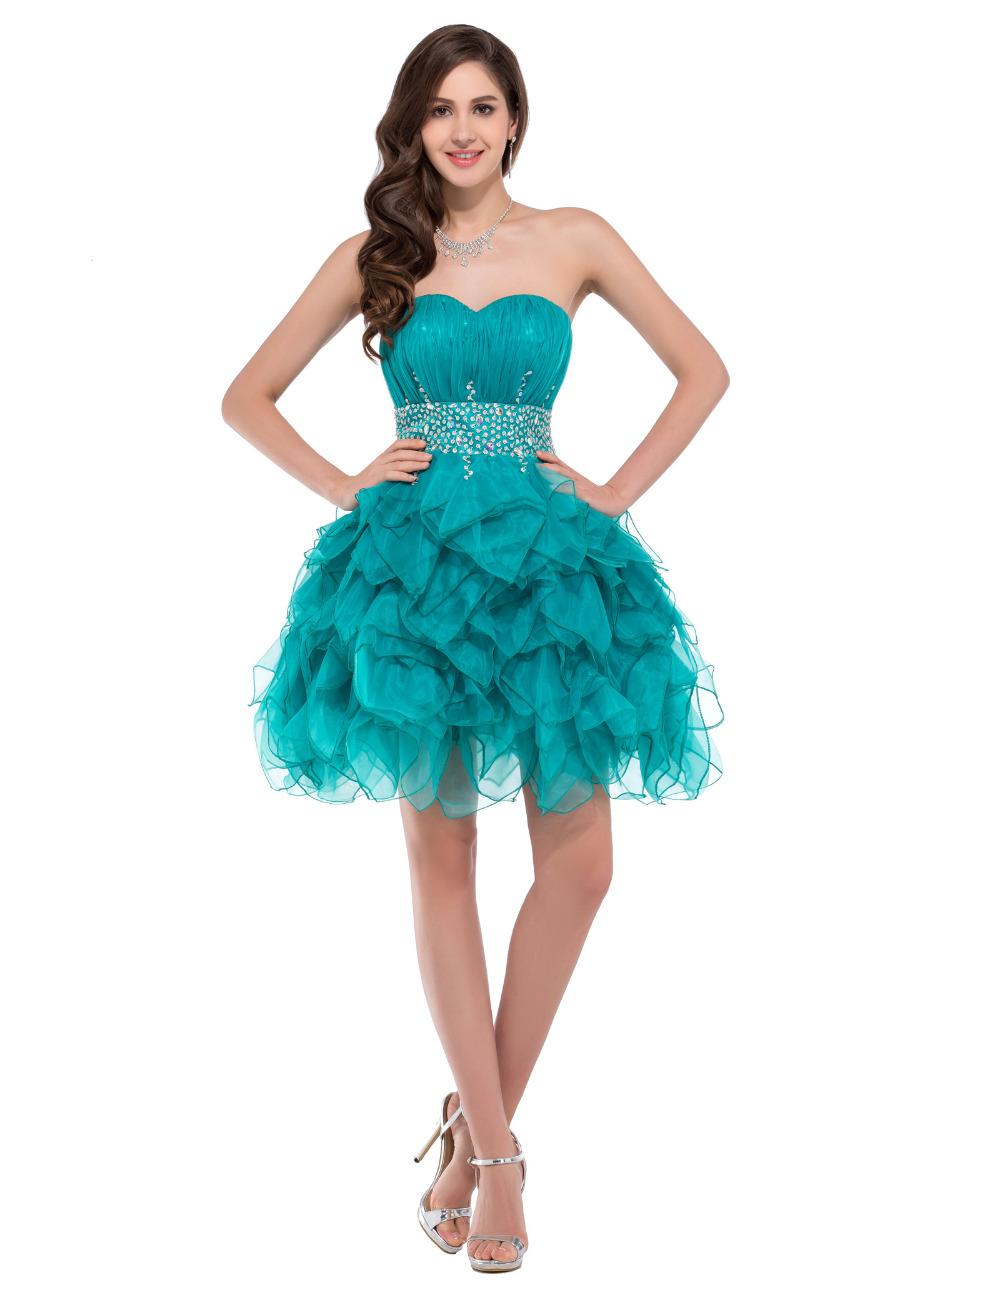 Popular Turquoise Short Prom Dresses Buy Cheap Turquoise Short Prom Dresses Lots From China